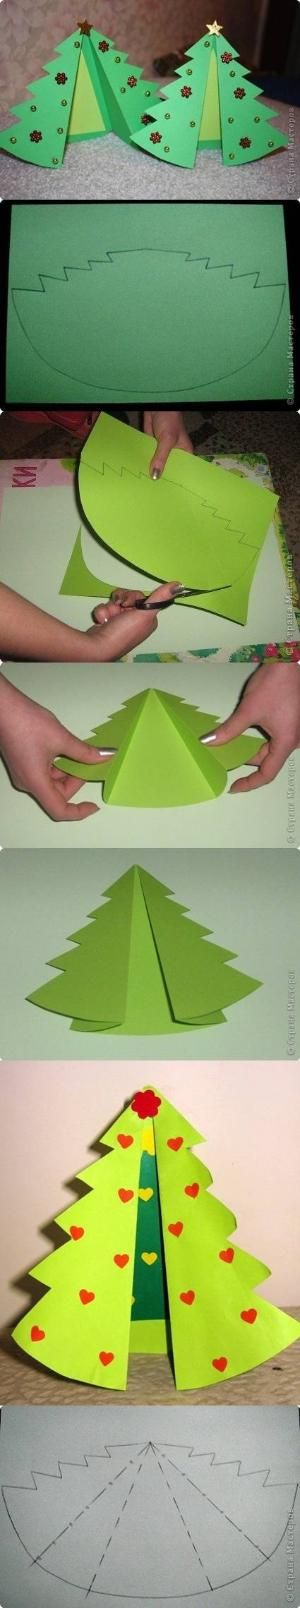 Christmas tree card diy, tutorial by diyforever